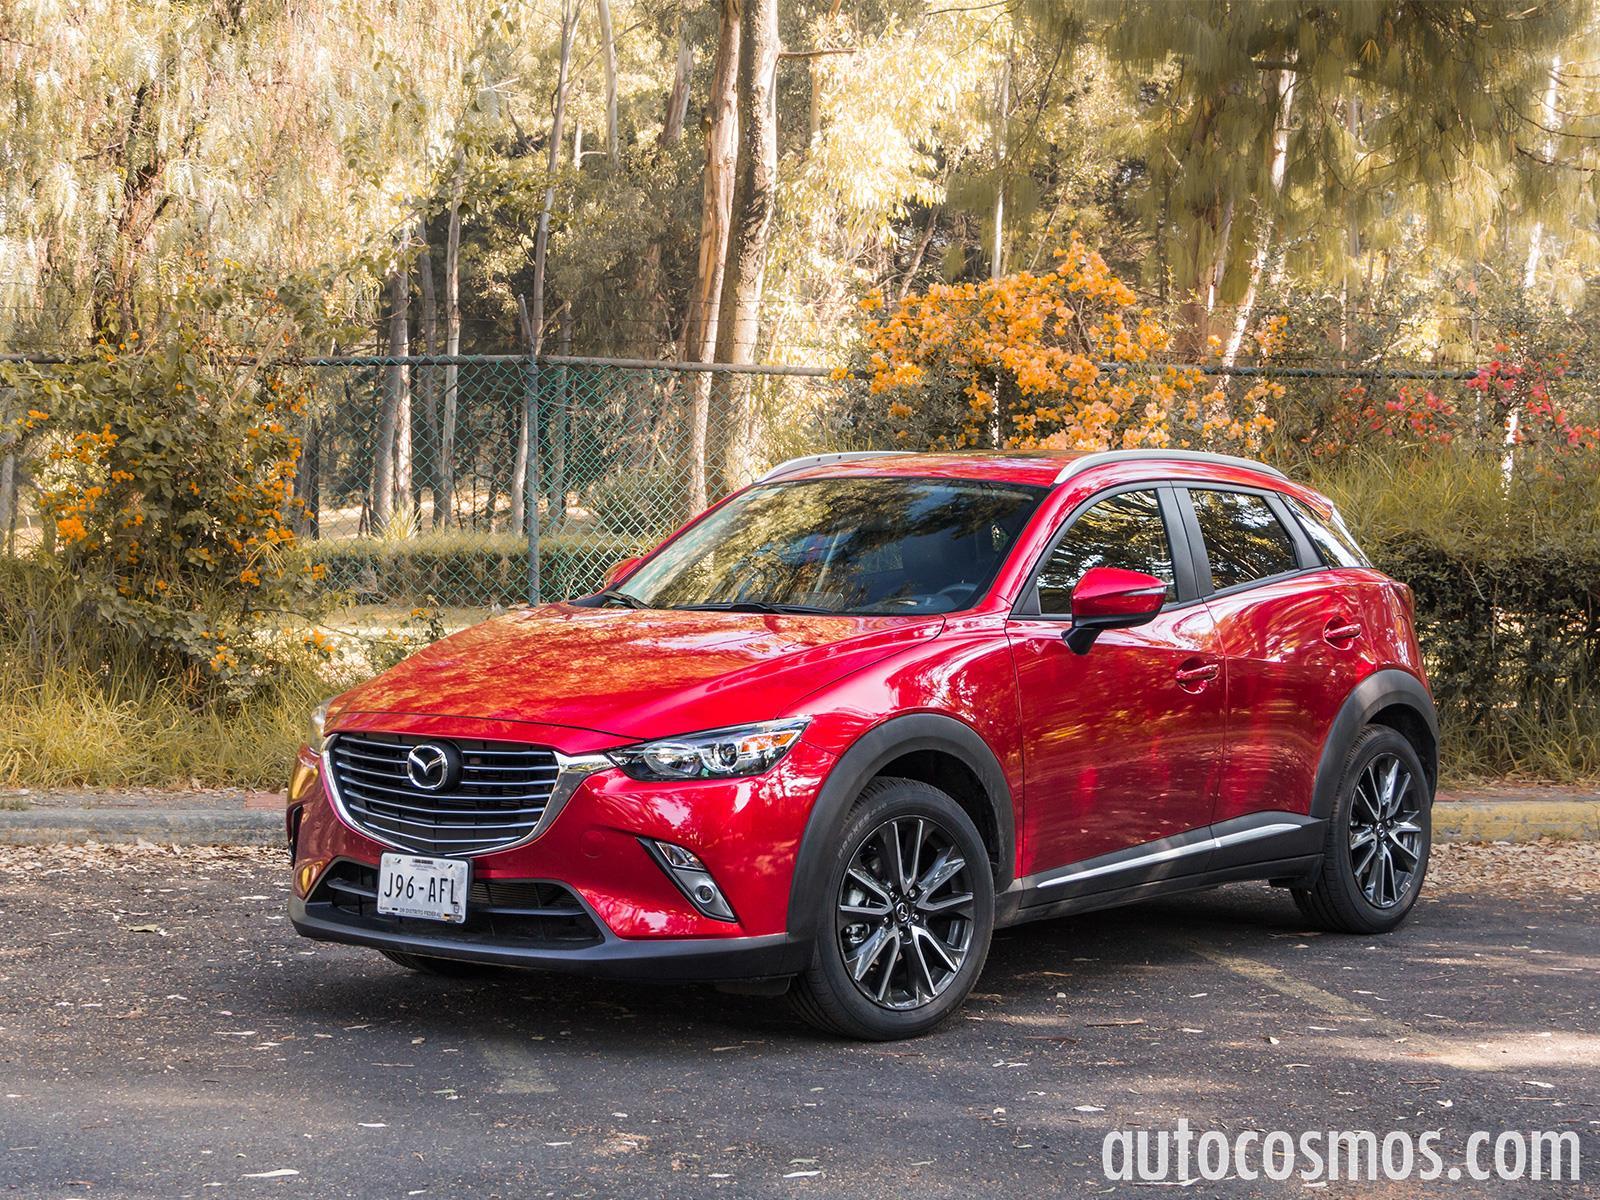 Mazda Cx 3 2016 Llega A M 233 Xico En 322 900 Pesos